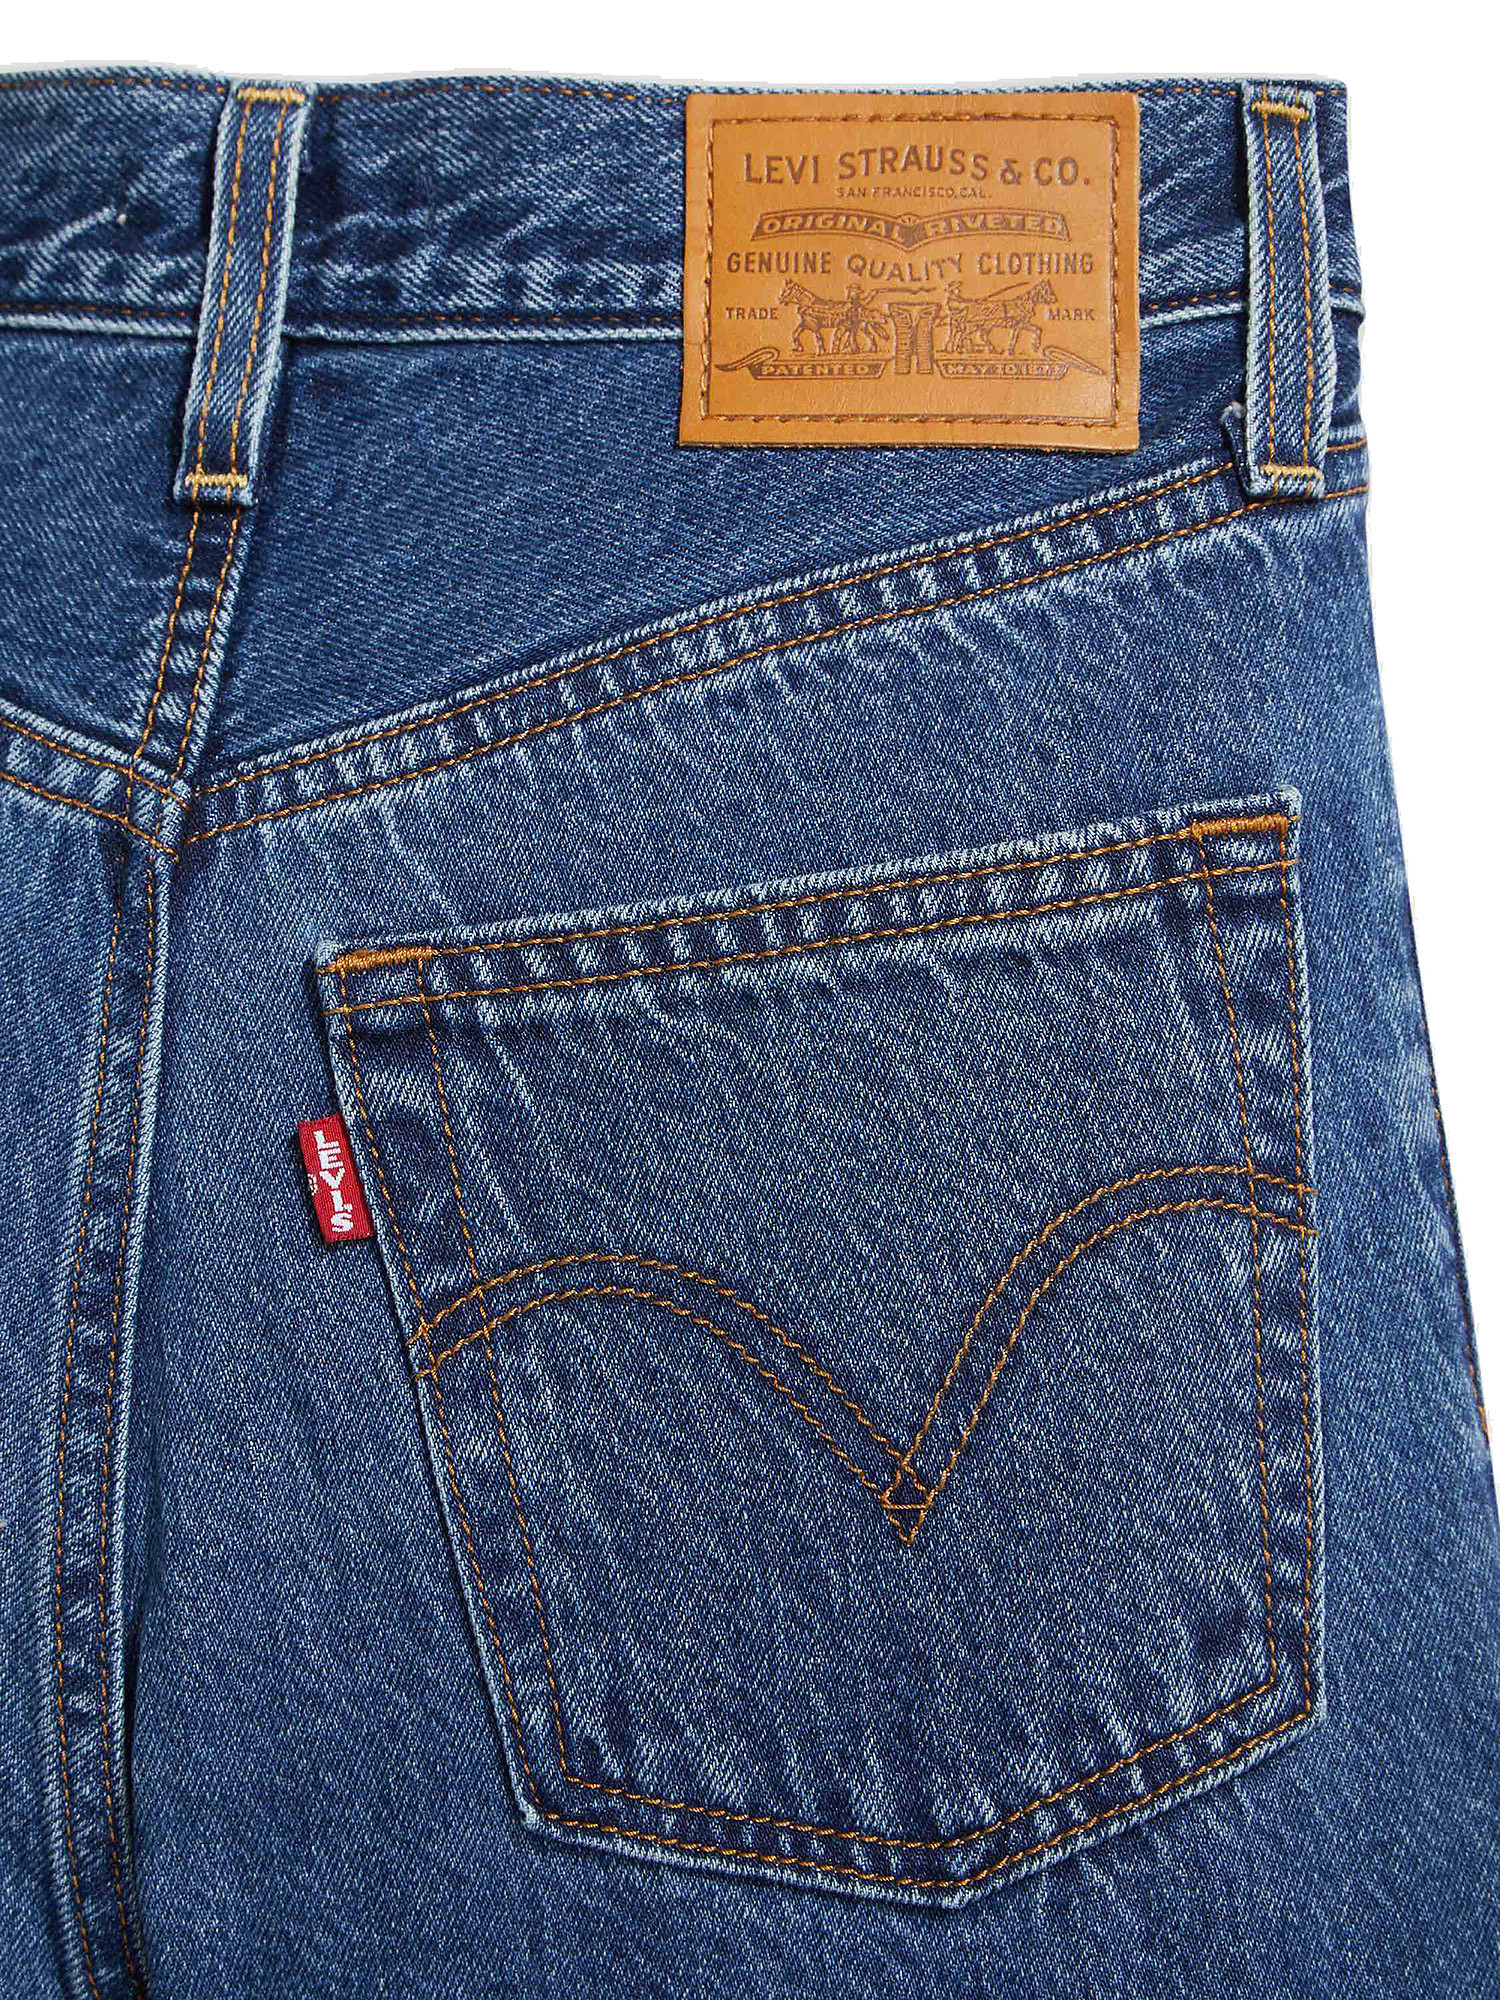 Jeans donna ribcage straight ankle, Denim, large image number 5